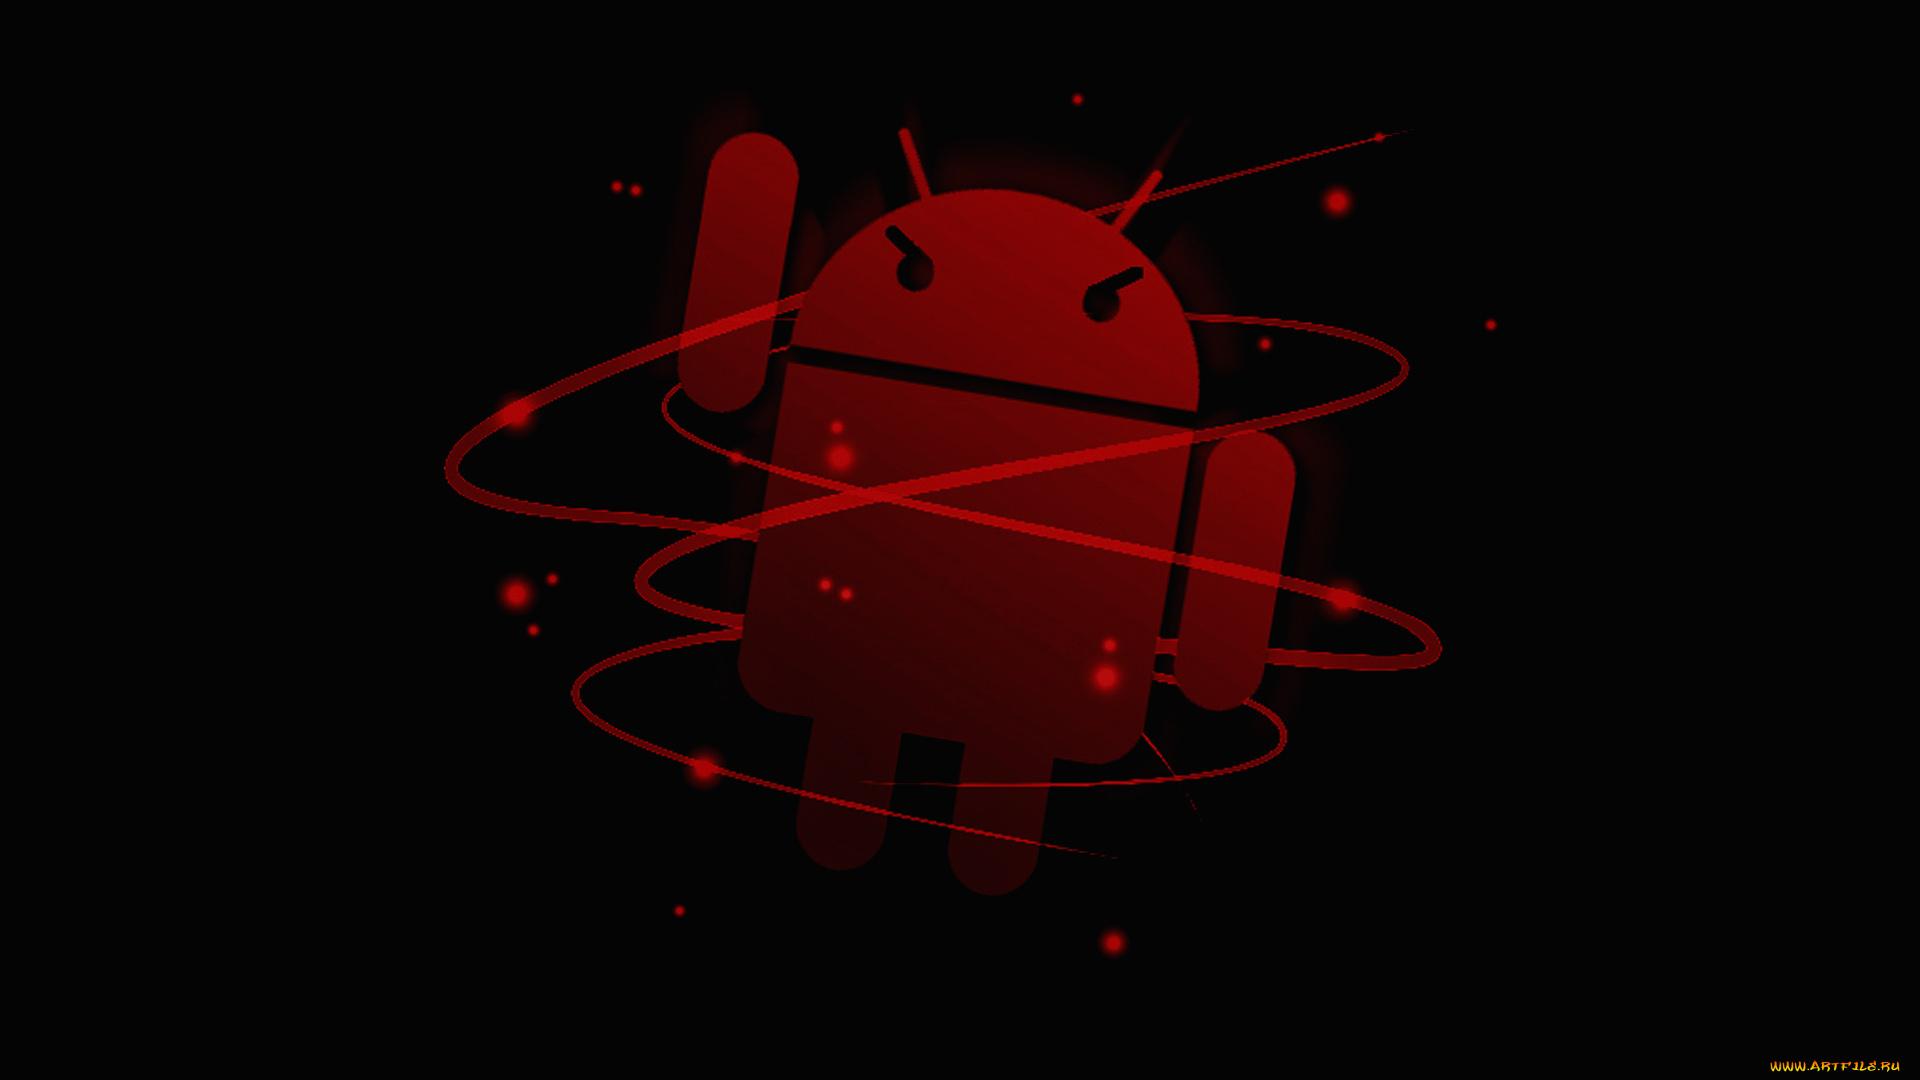 Обои На Телефон Андроид 720х1280